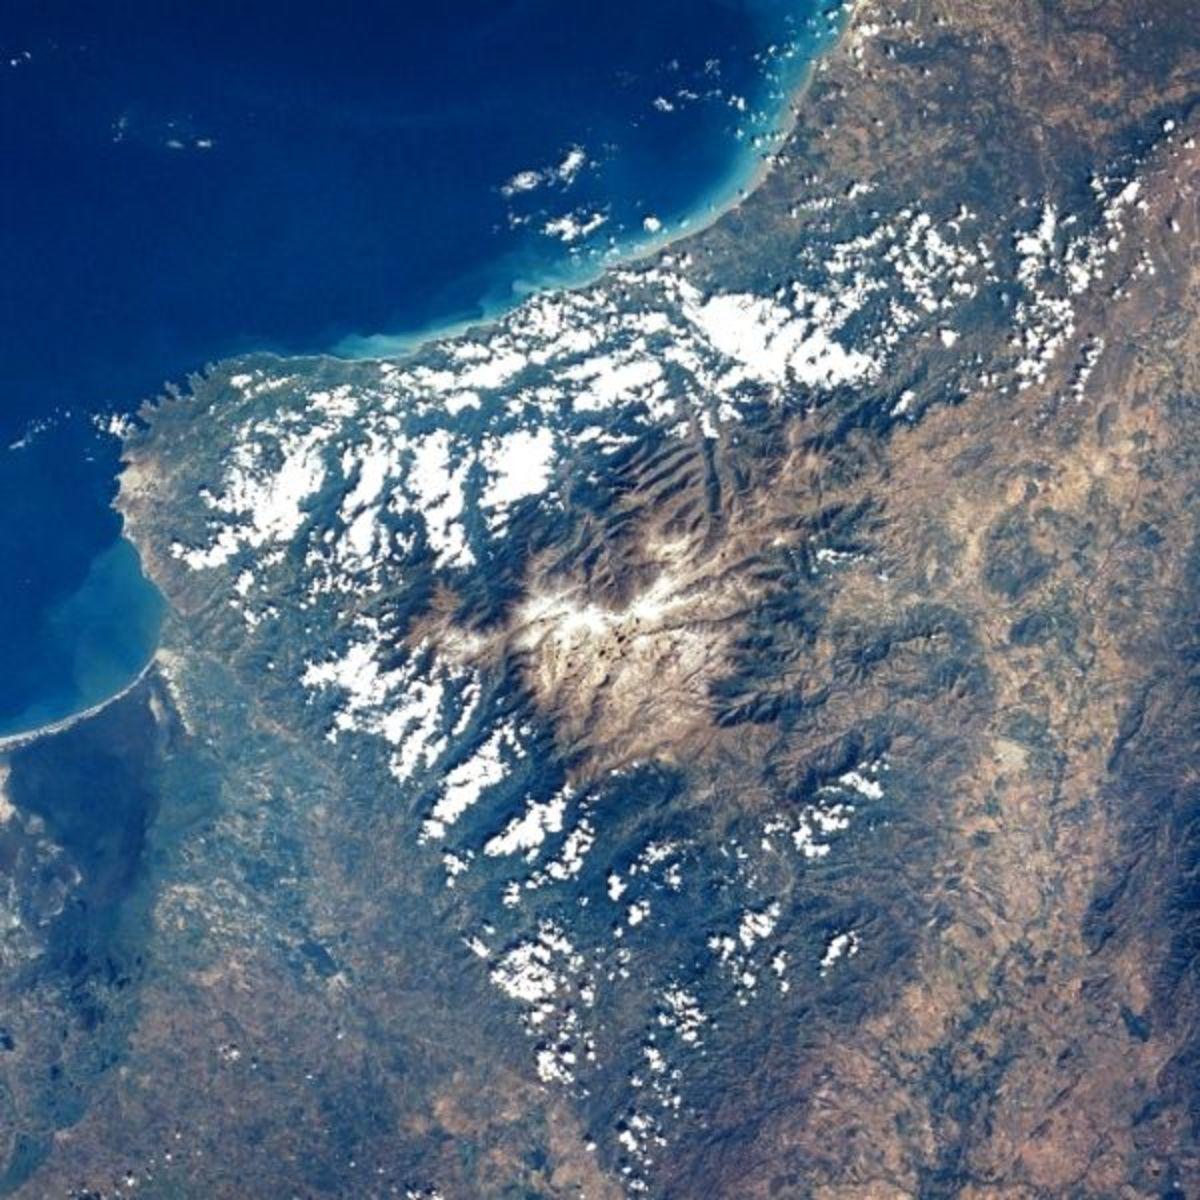 Kogi Guardians from the Heart of the World on the Sierra Nevada de Santa Marta